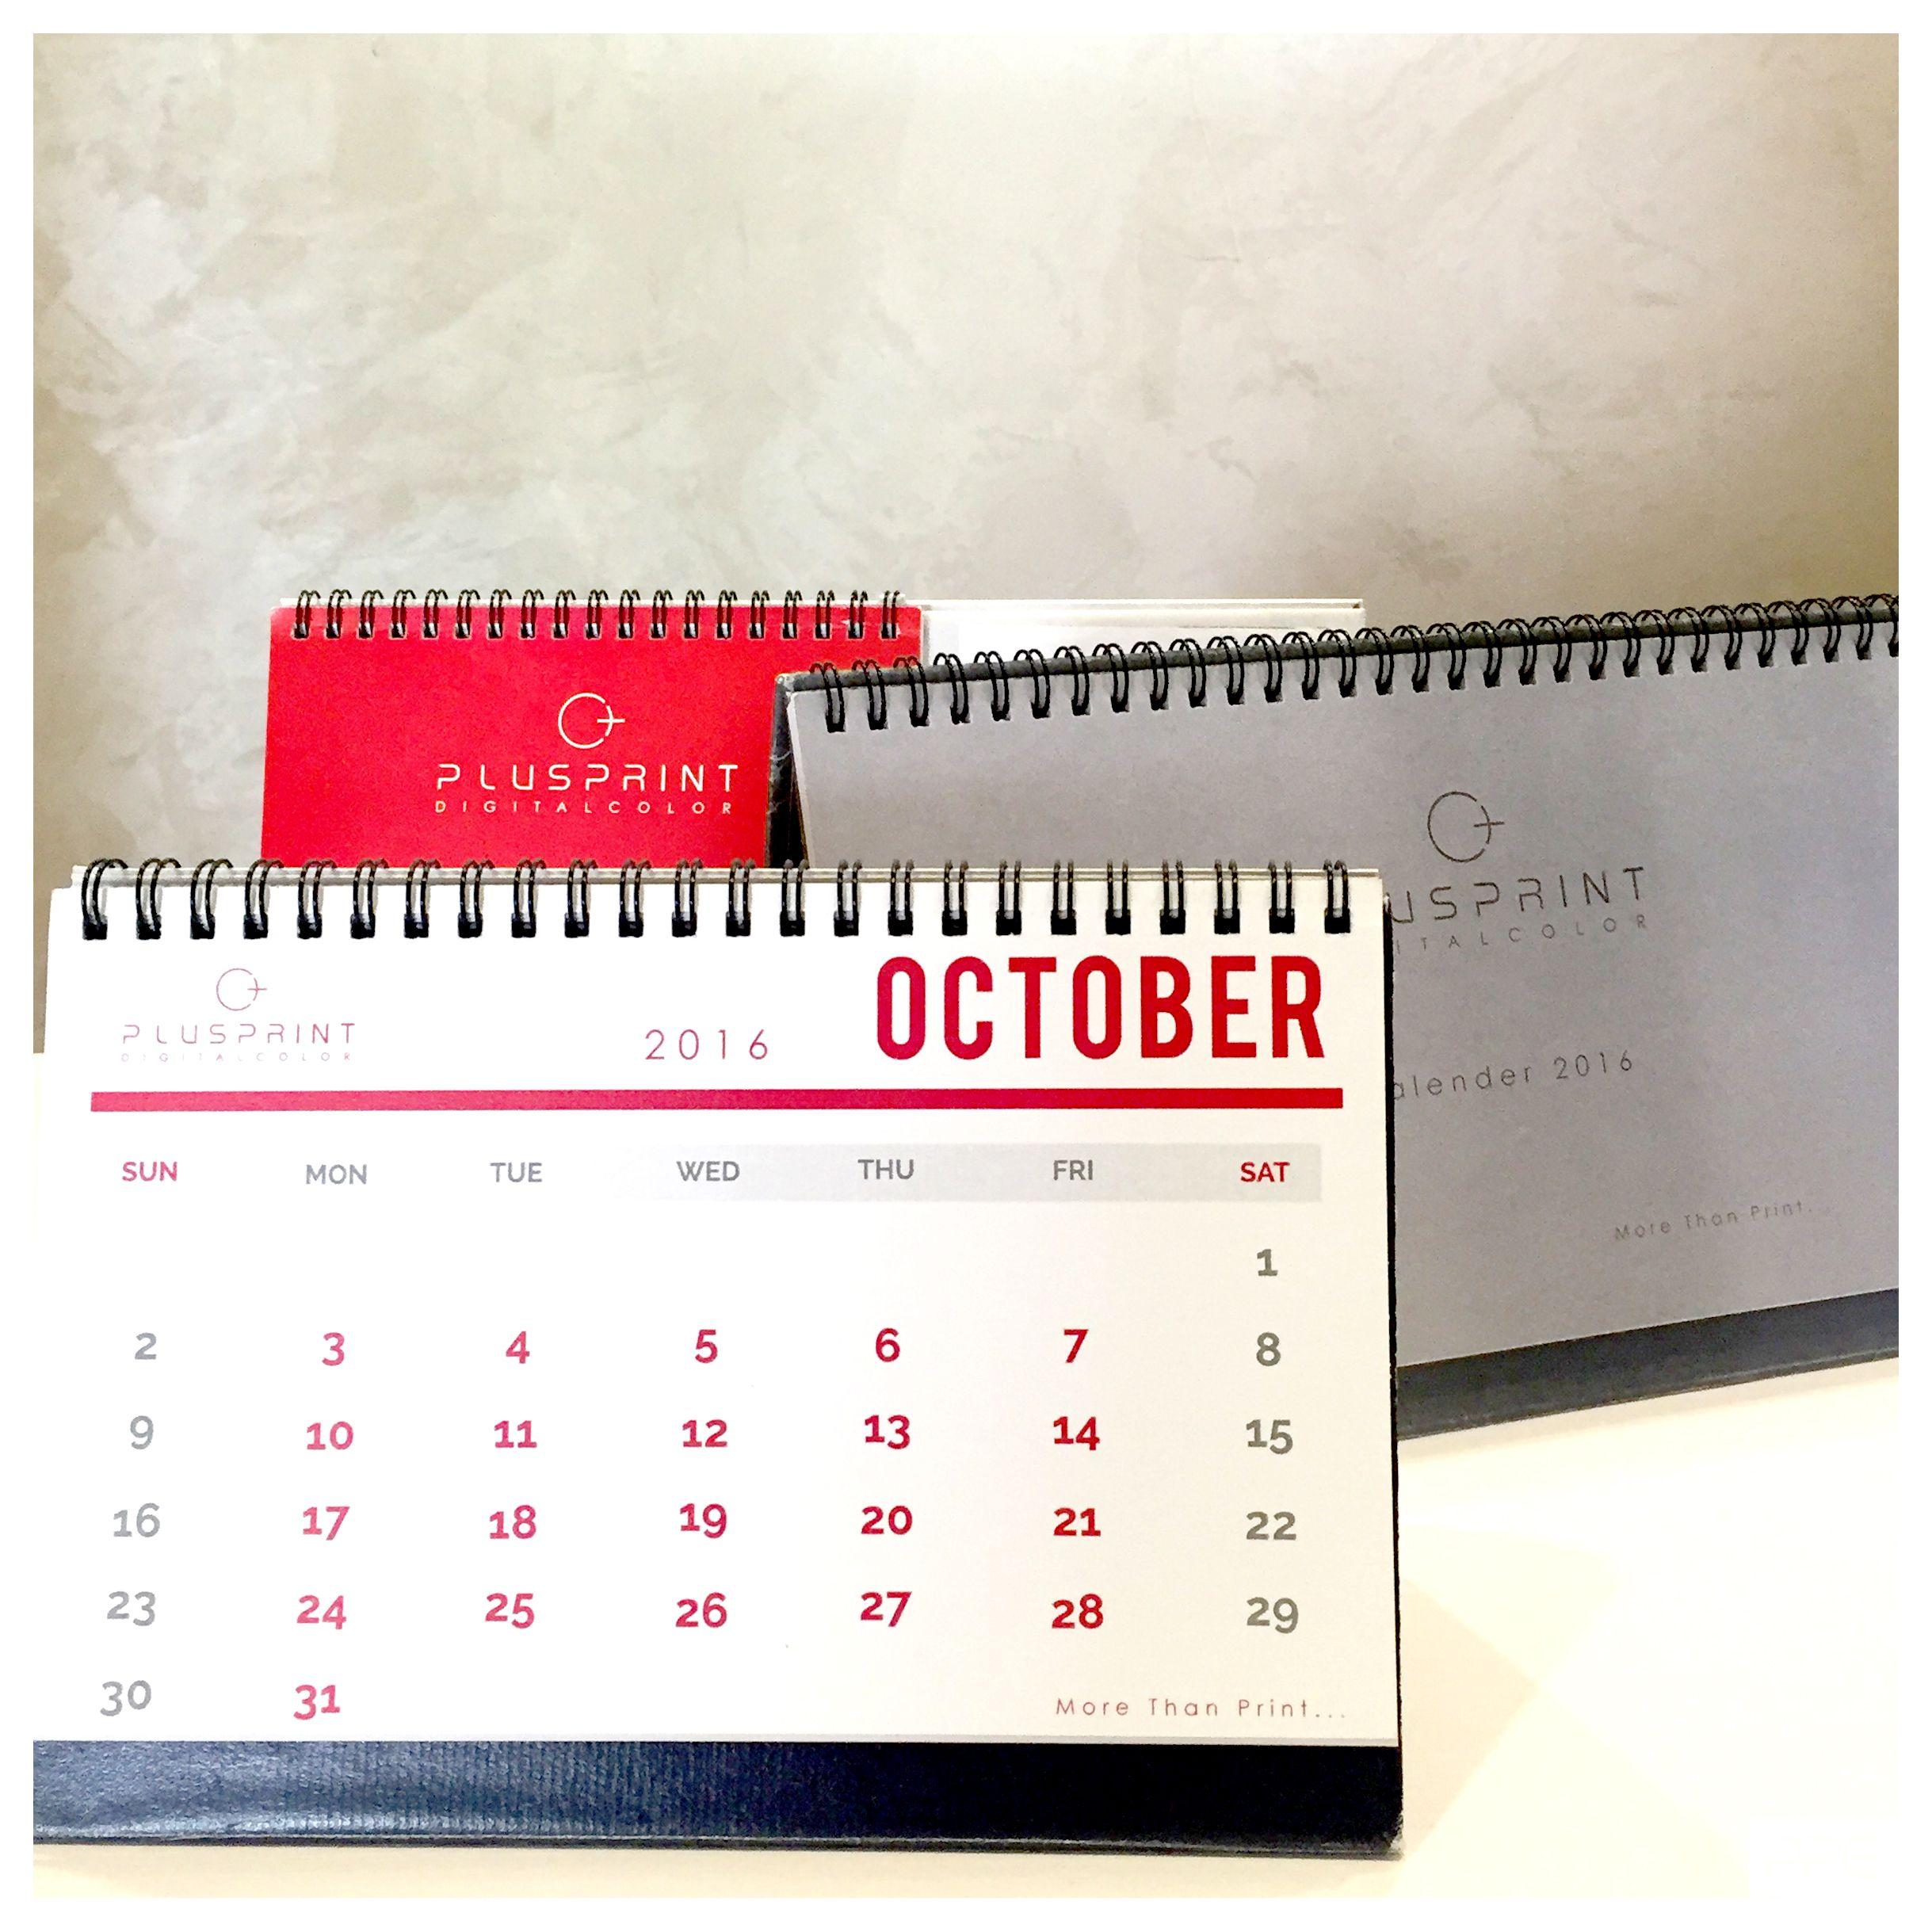 Calendar L تقويم تصميم طباعه مطبوعات مطبعه جده بطاقات هوية شركة تصميم مصممين قص جدة فن تاق تقويم صور دفاتر كتب Styleartlov 10 Things 9 And 10